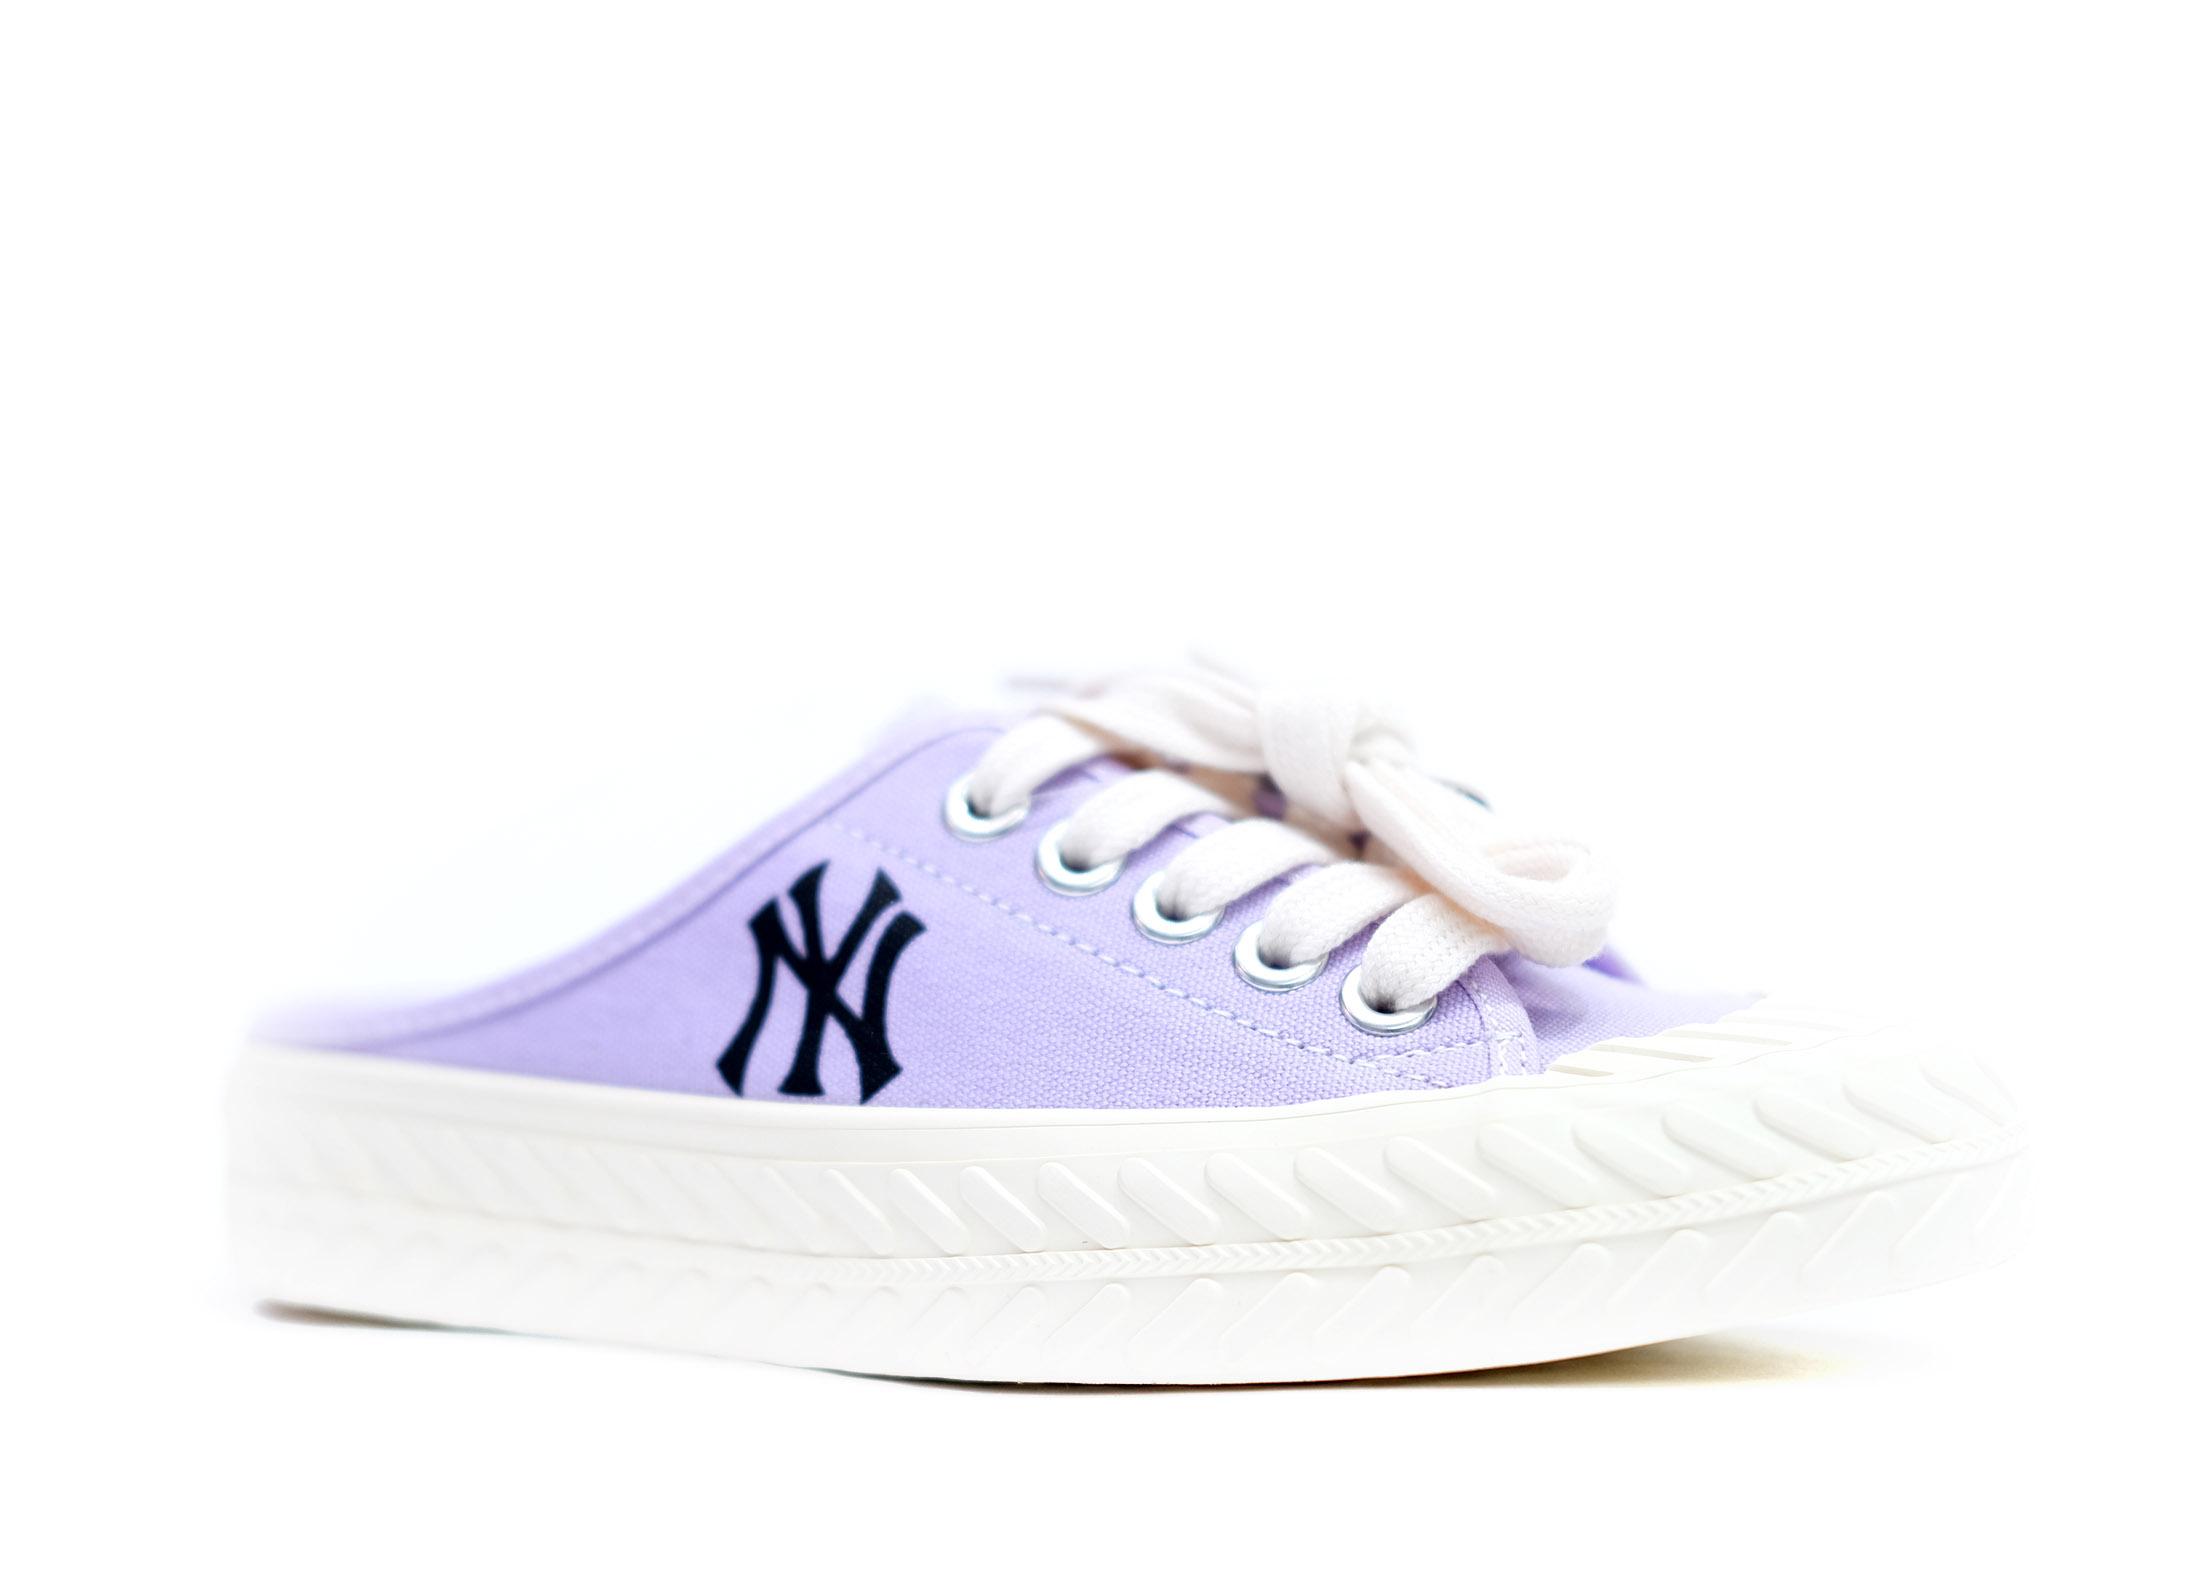 mlb-playball-origin-mule-ny-dodgers-violet